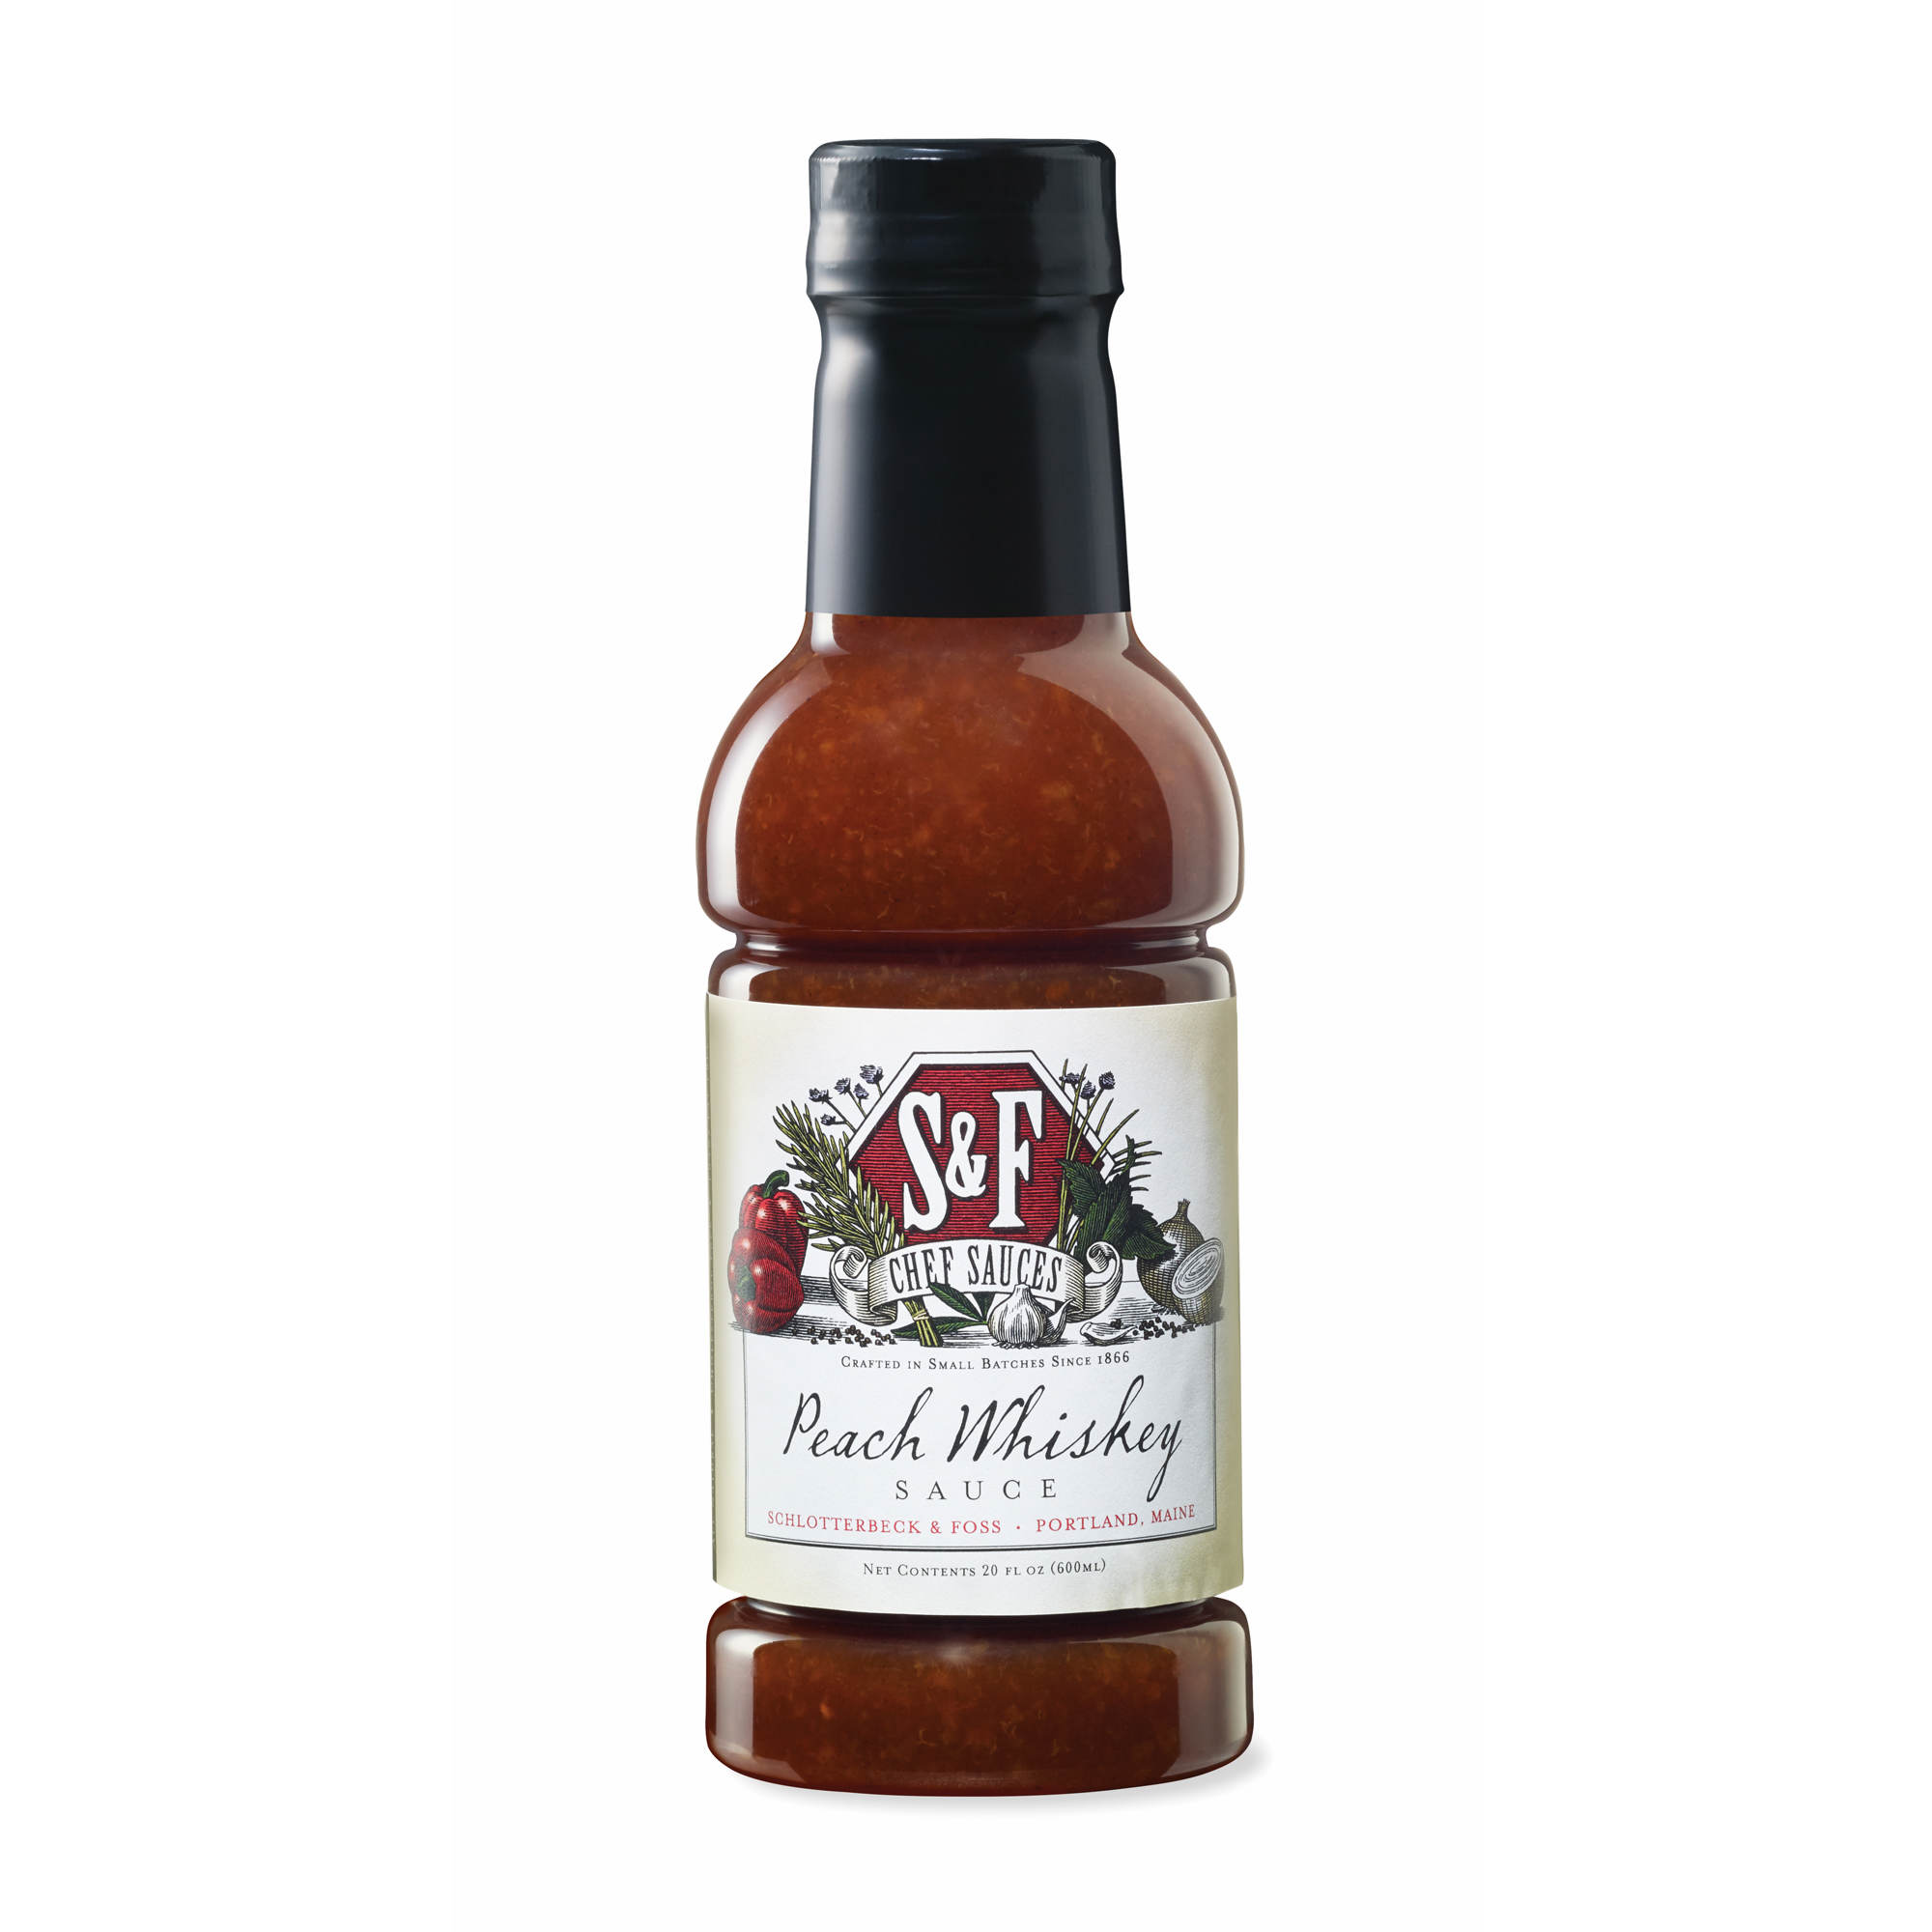 S&F Peach Whiskey Sauce, 20 oz. - BJ's Wholesale Club